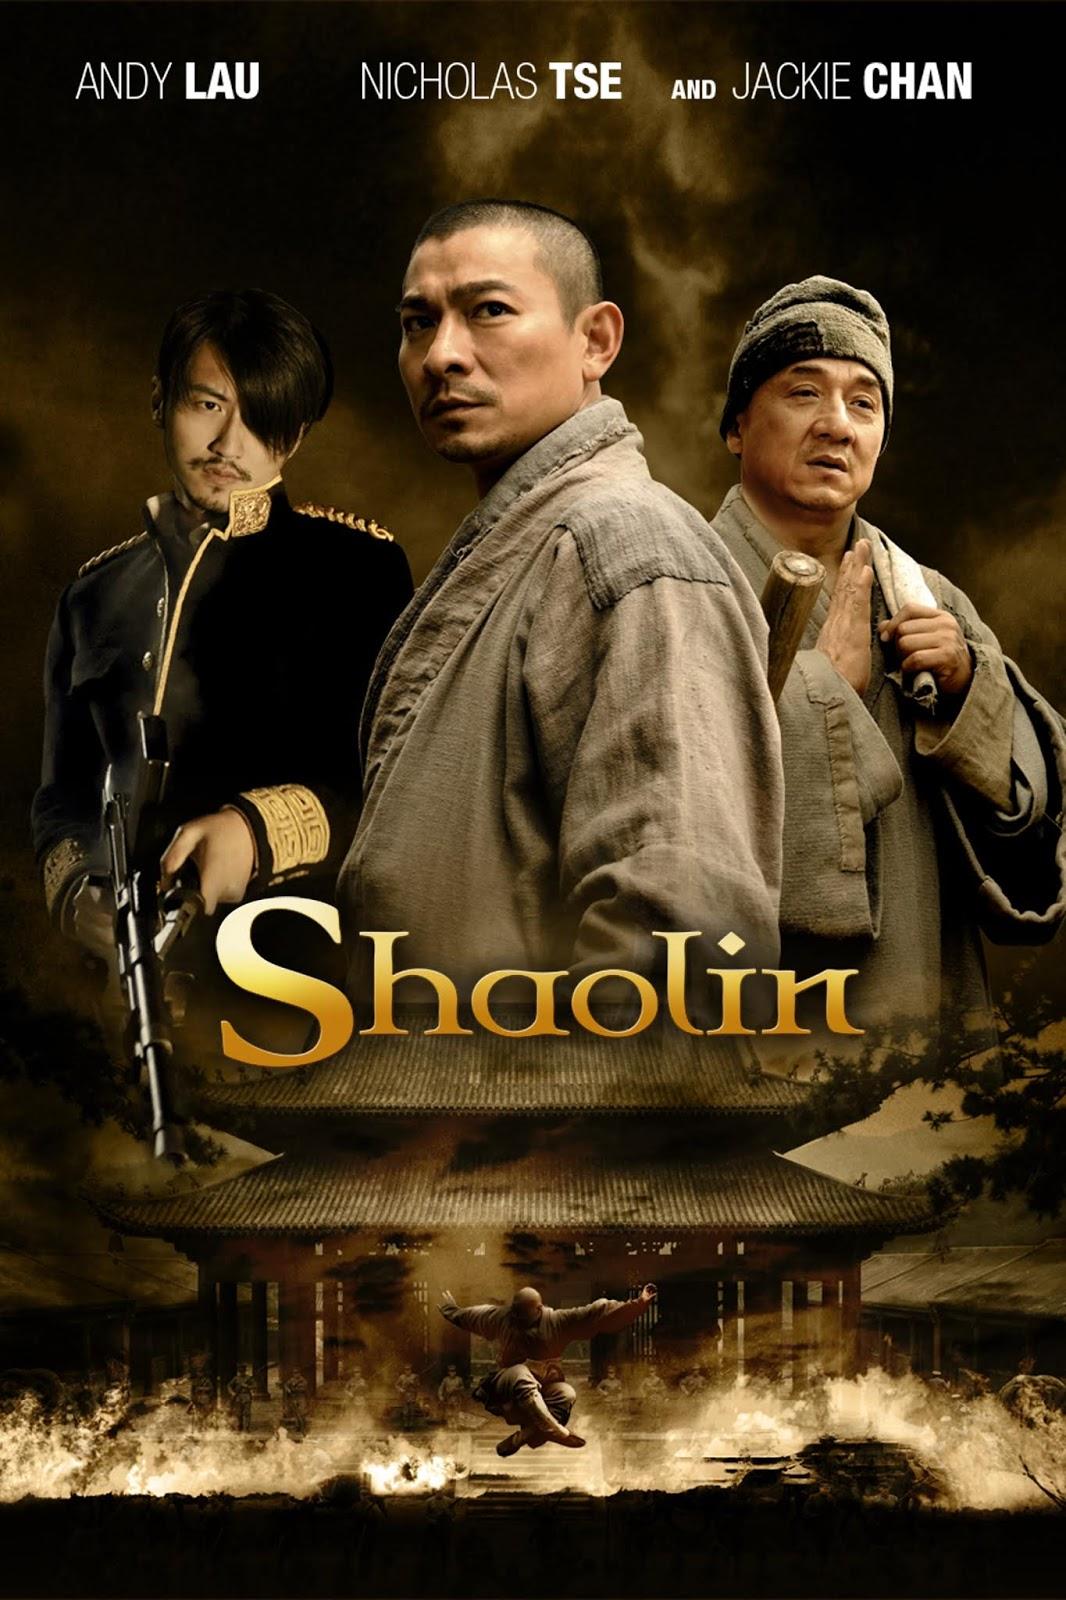 SHAOLIN (2011) MOVIE TAMIL DUBBED HD